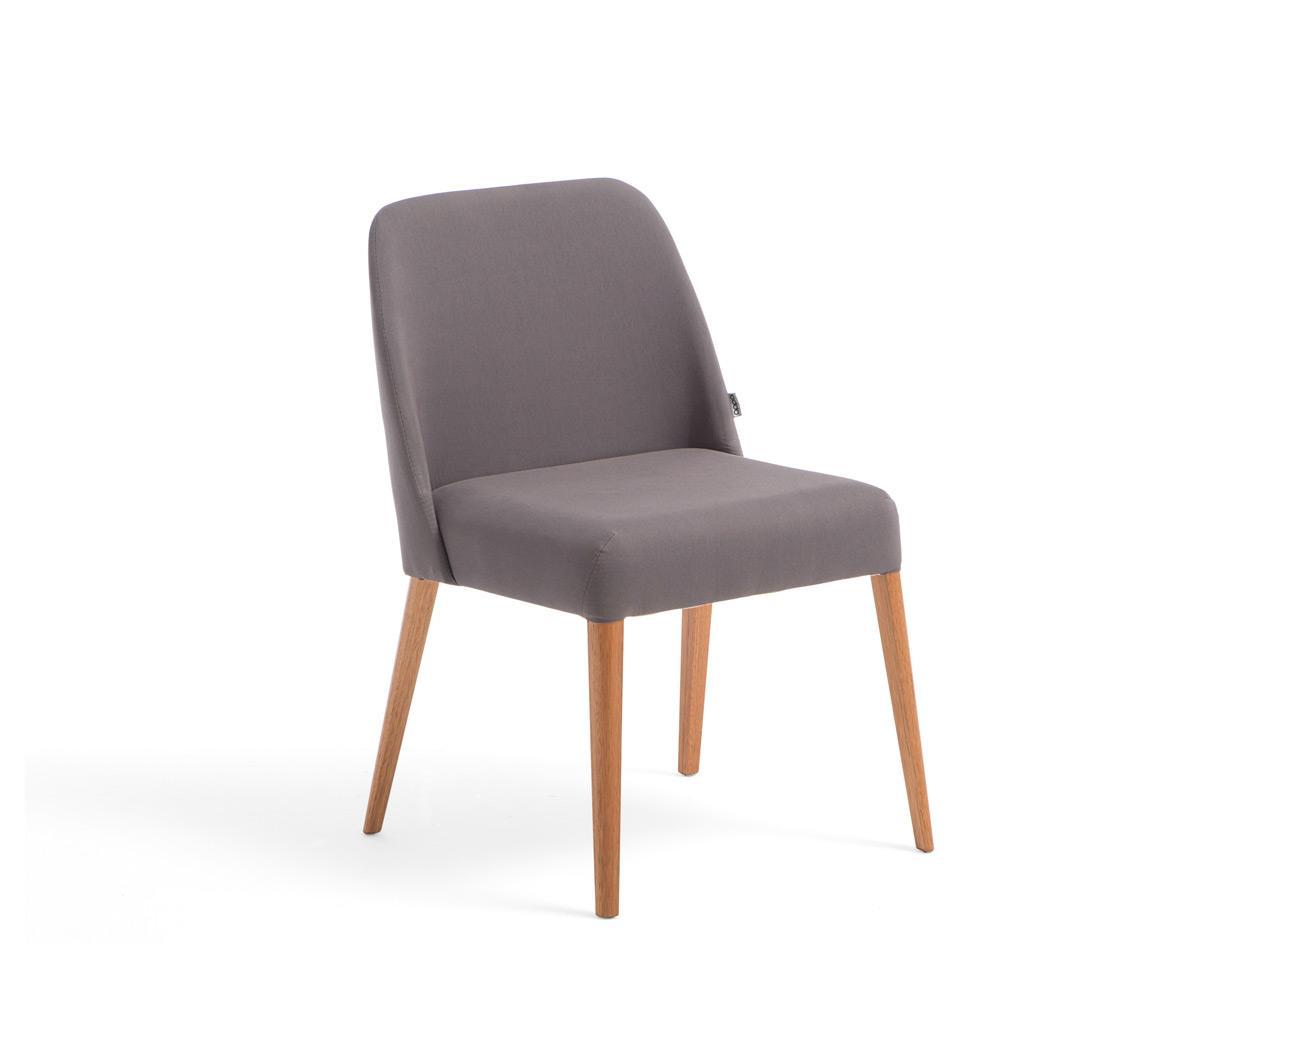 cadeira rosini cinza oppa